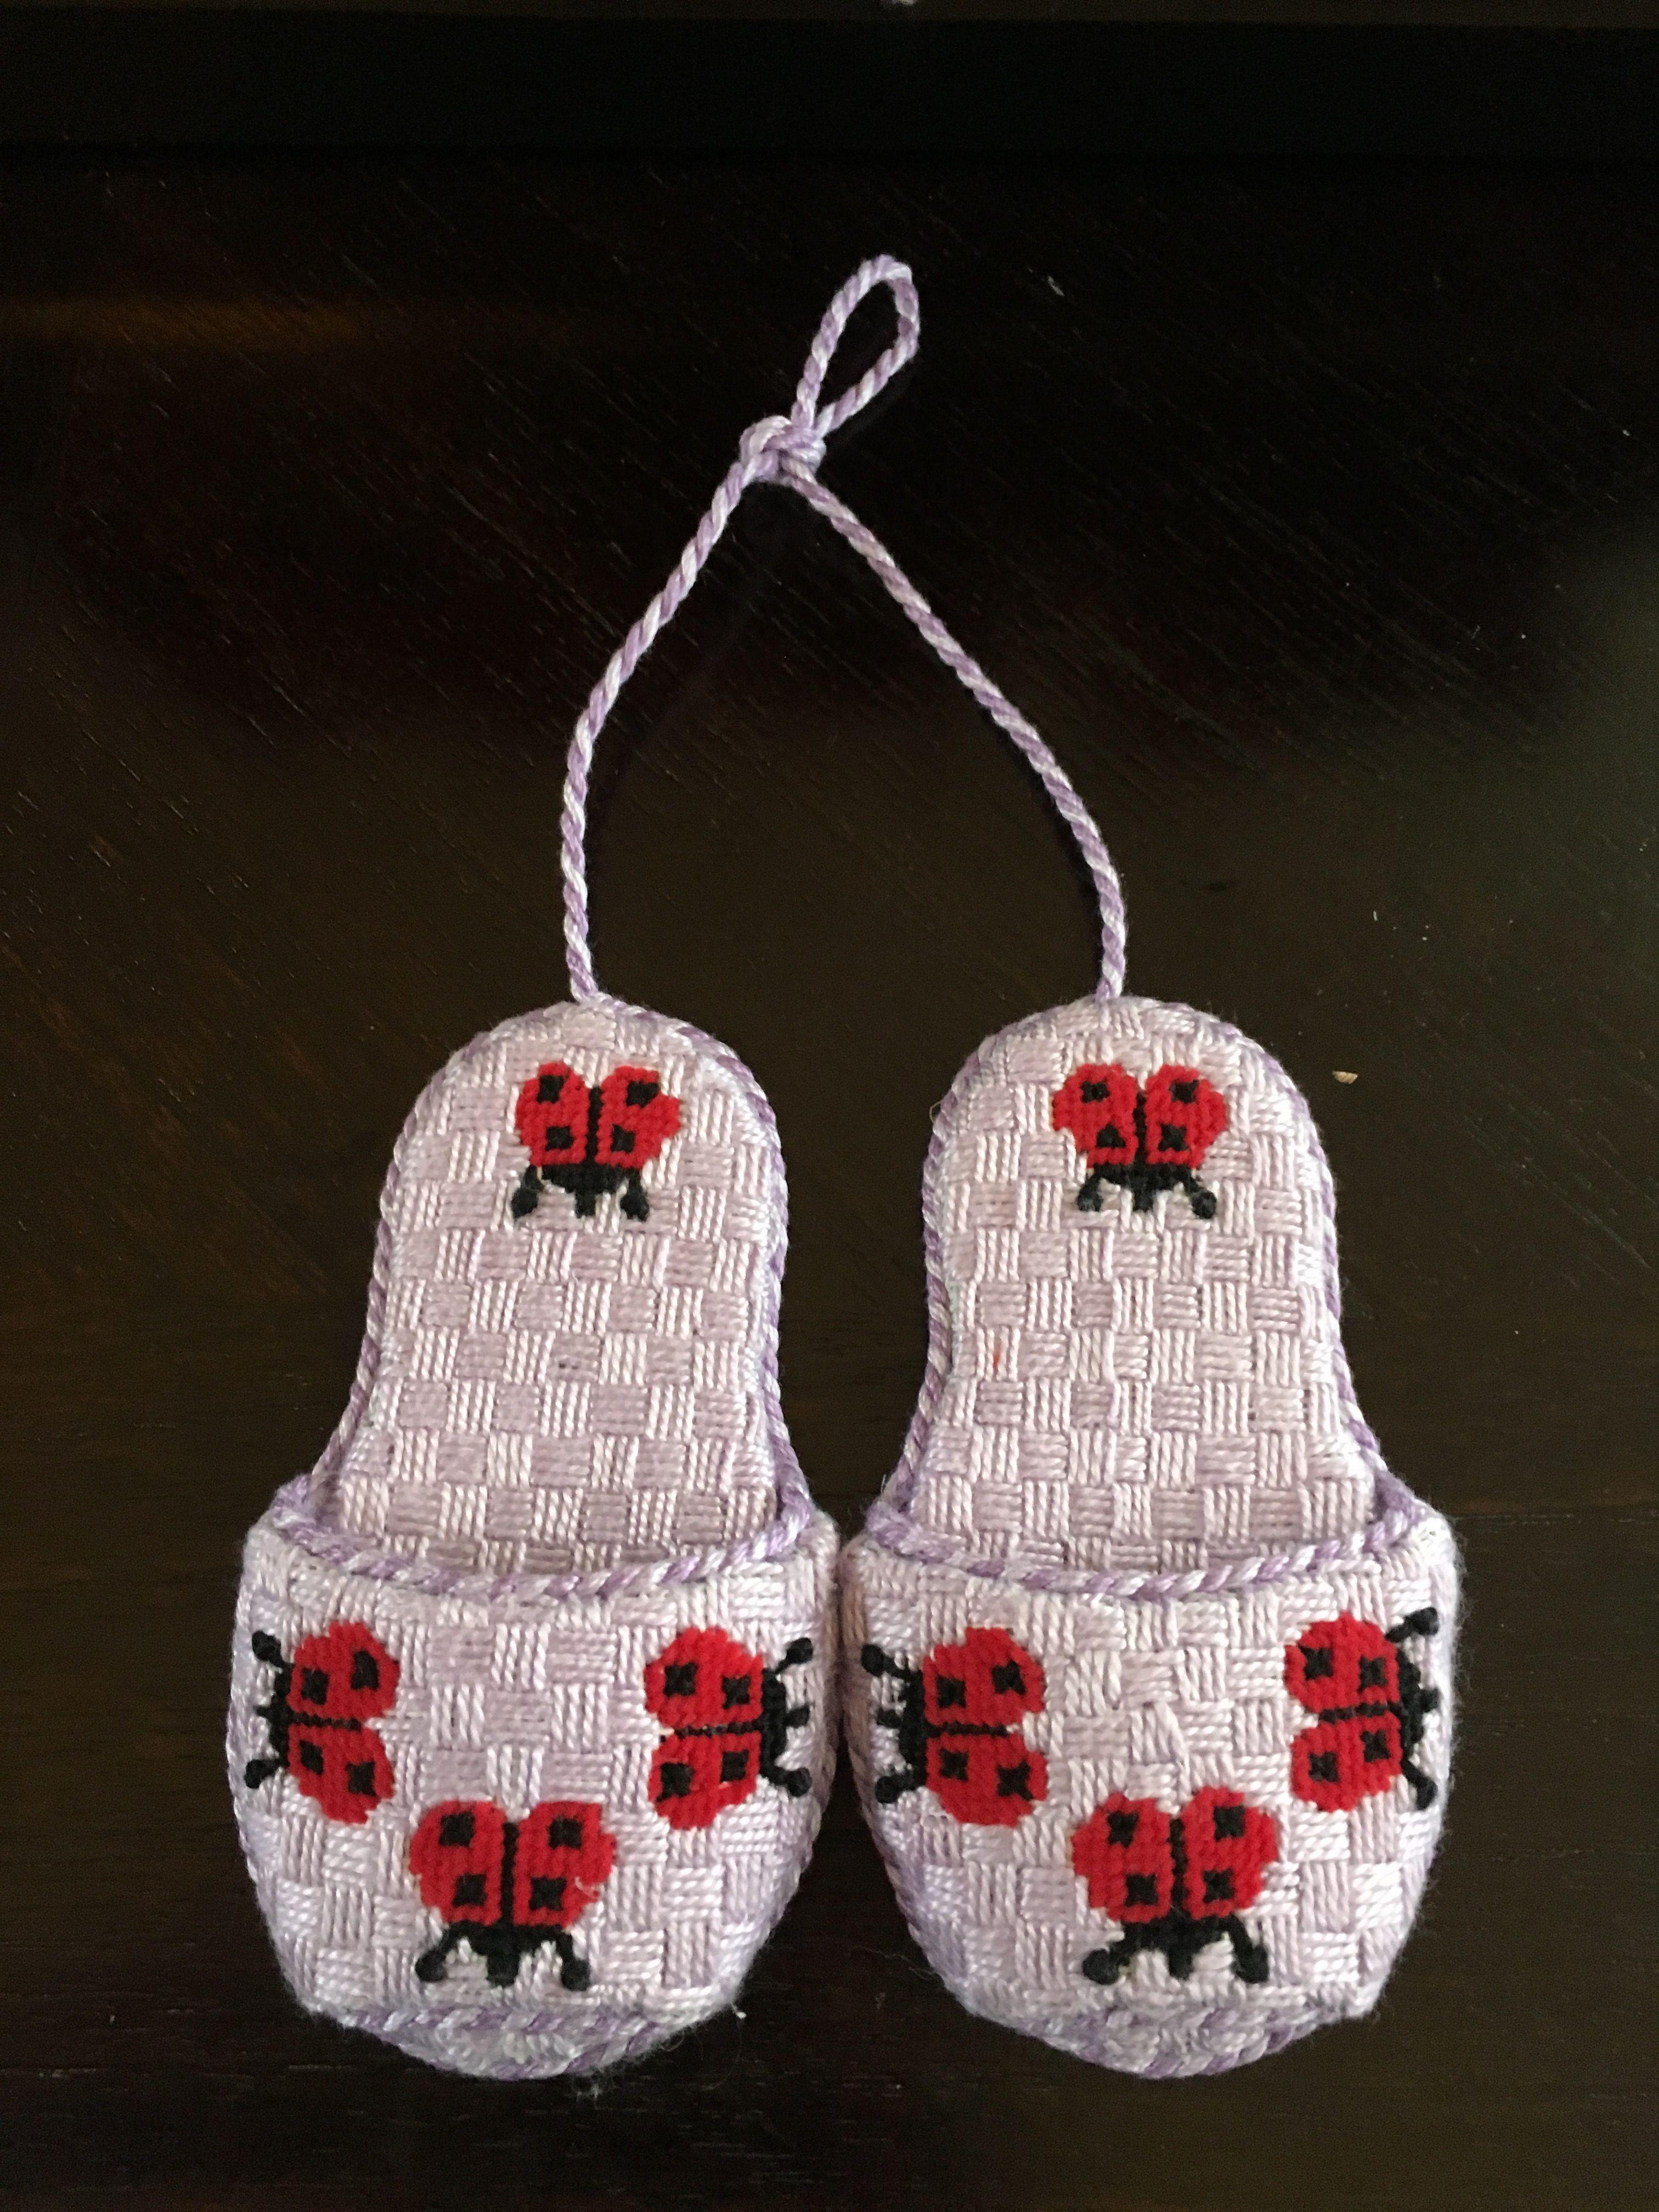 Ladybug Slipper Needlepoint Ornament, Designer Unknown